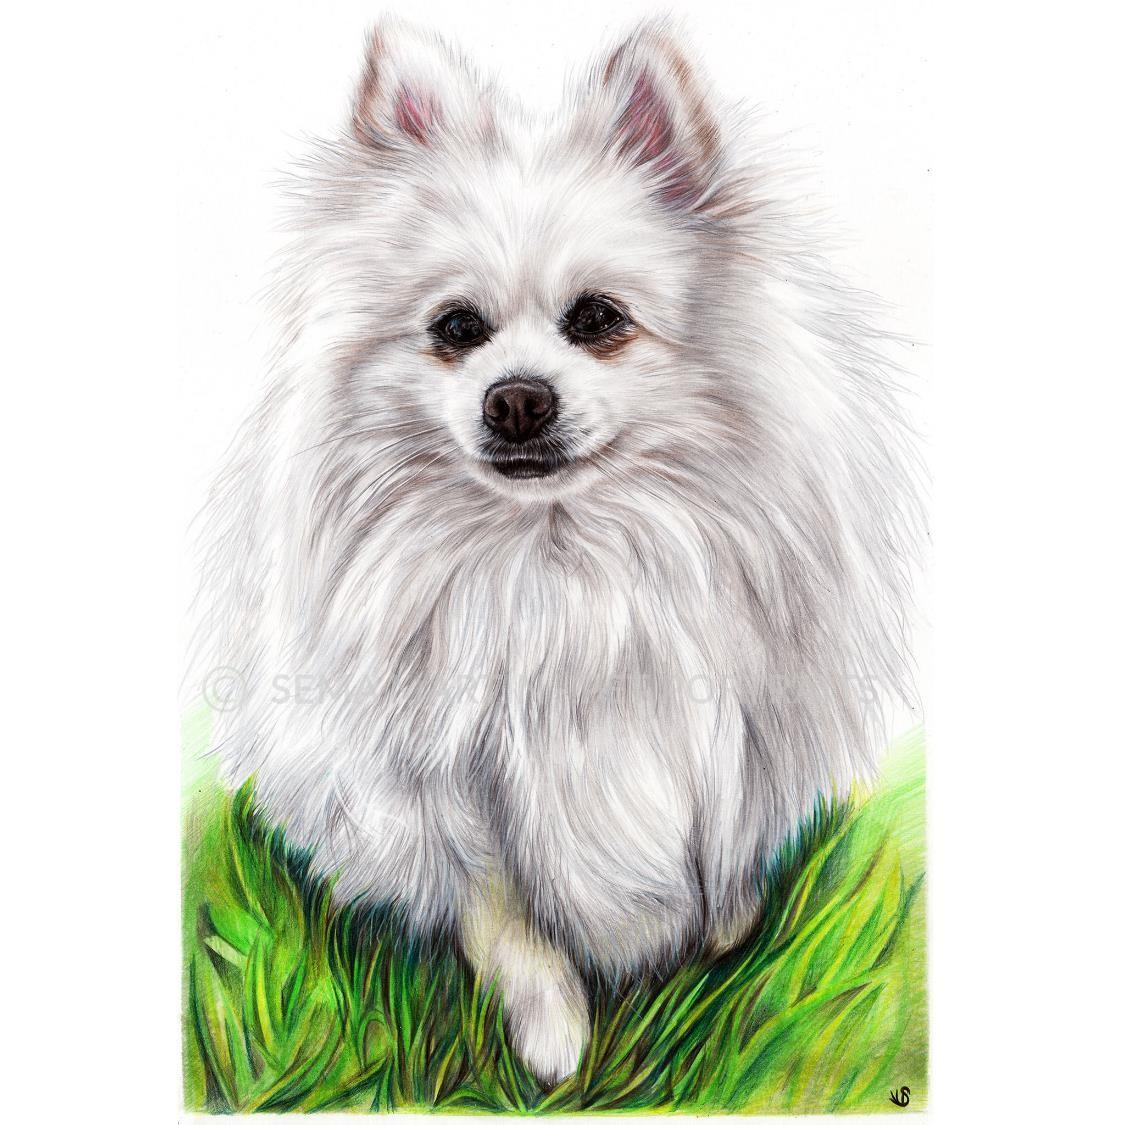 'Casper' - UK, 11.7 x 16.5 inches, 2019, Colour Pencil Pomeranian Portrait